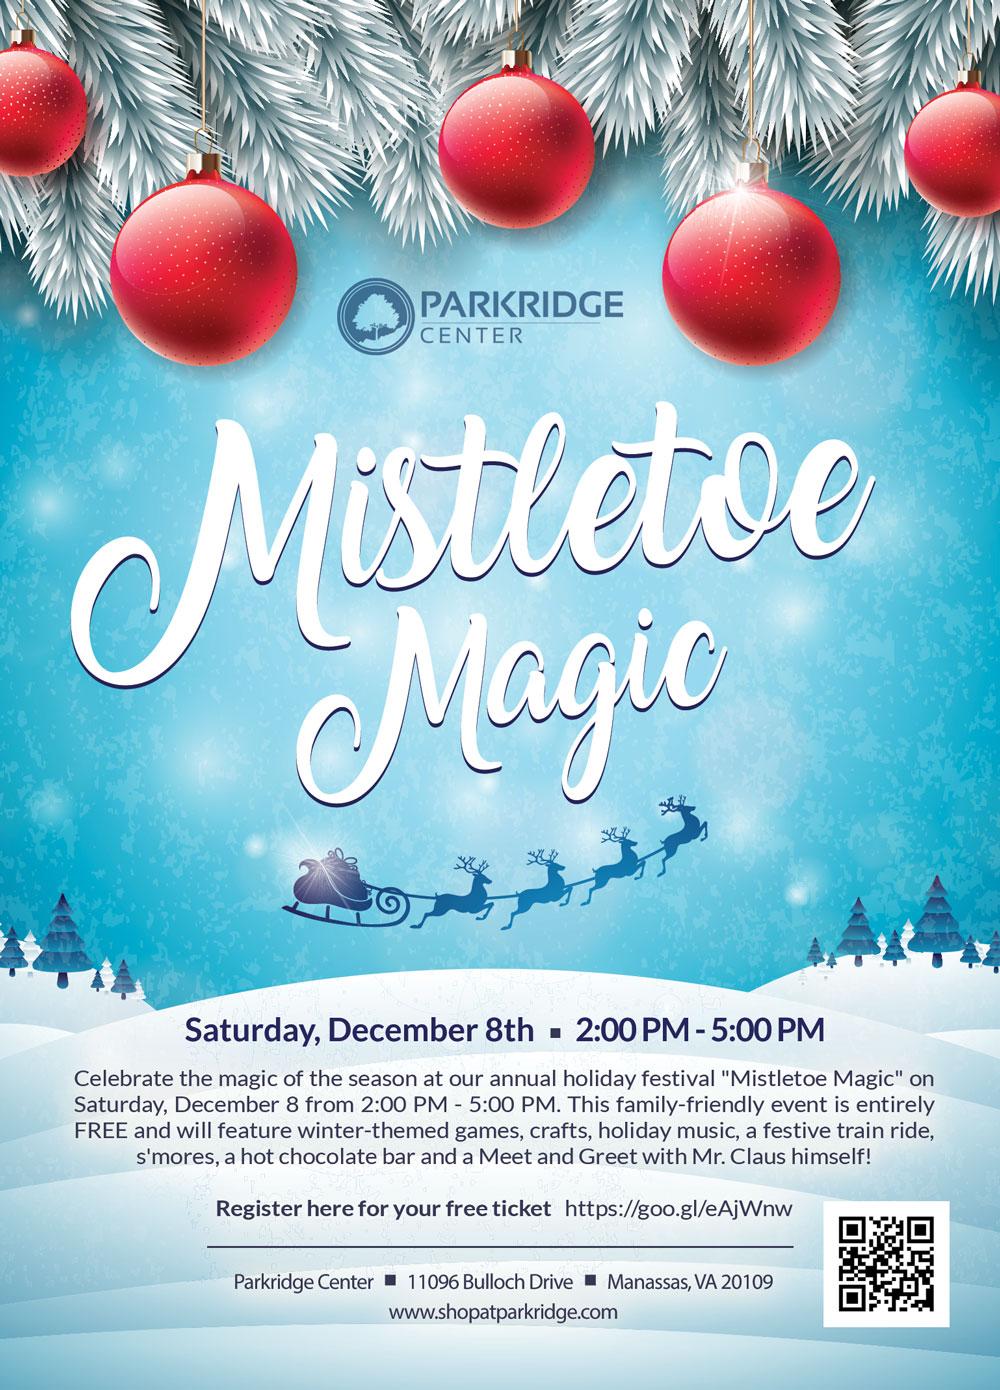 Mistletoe Magic Holiday Festival, Parkridge Center